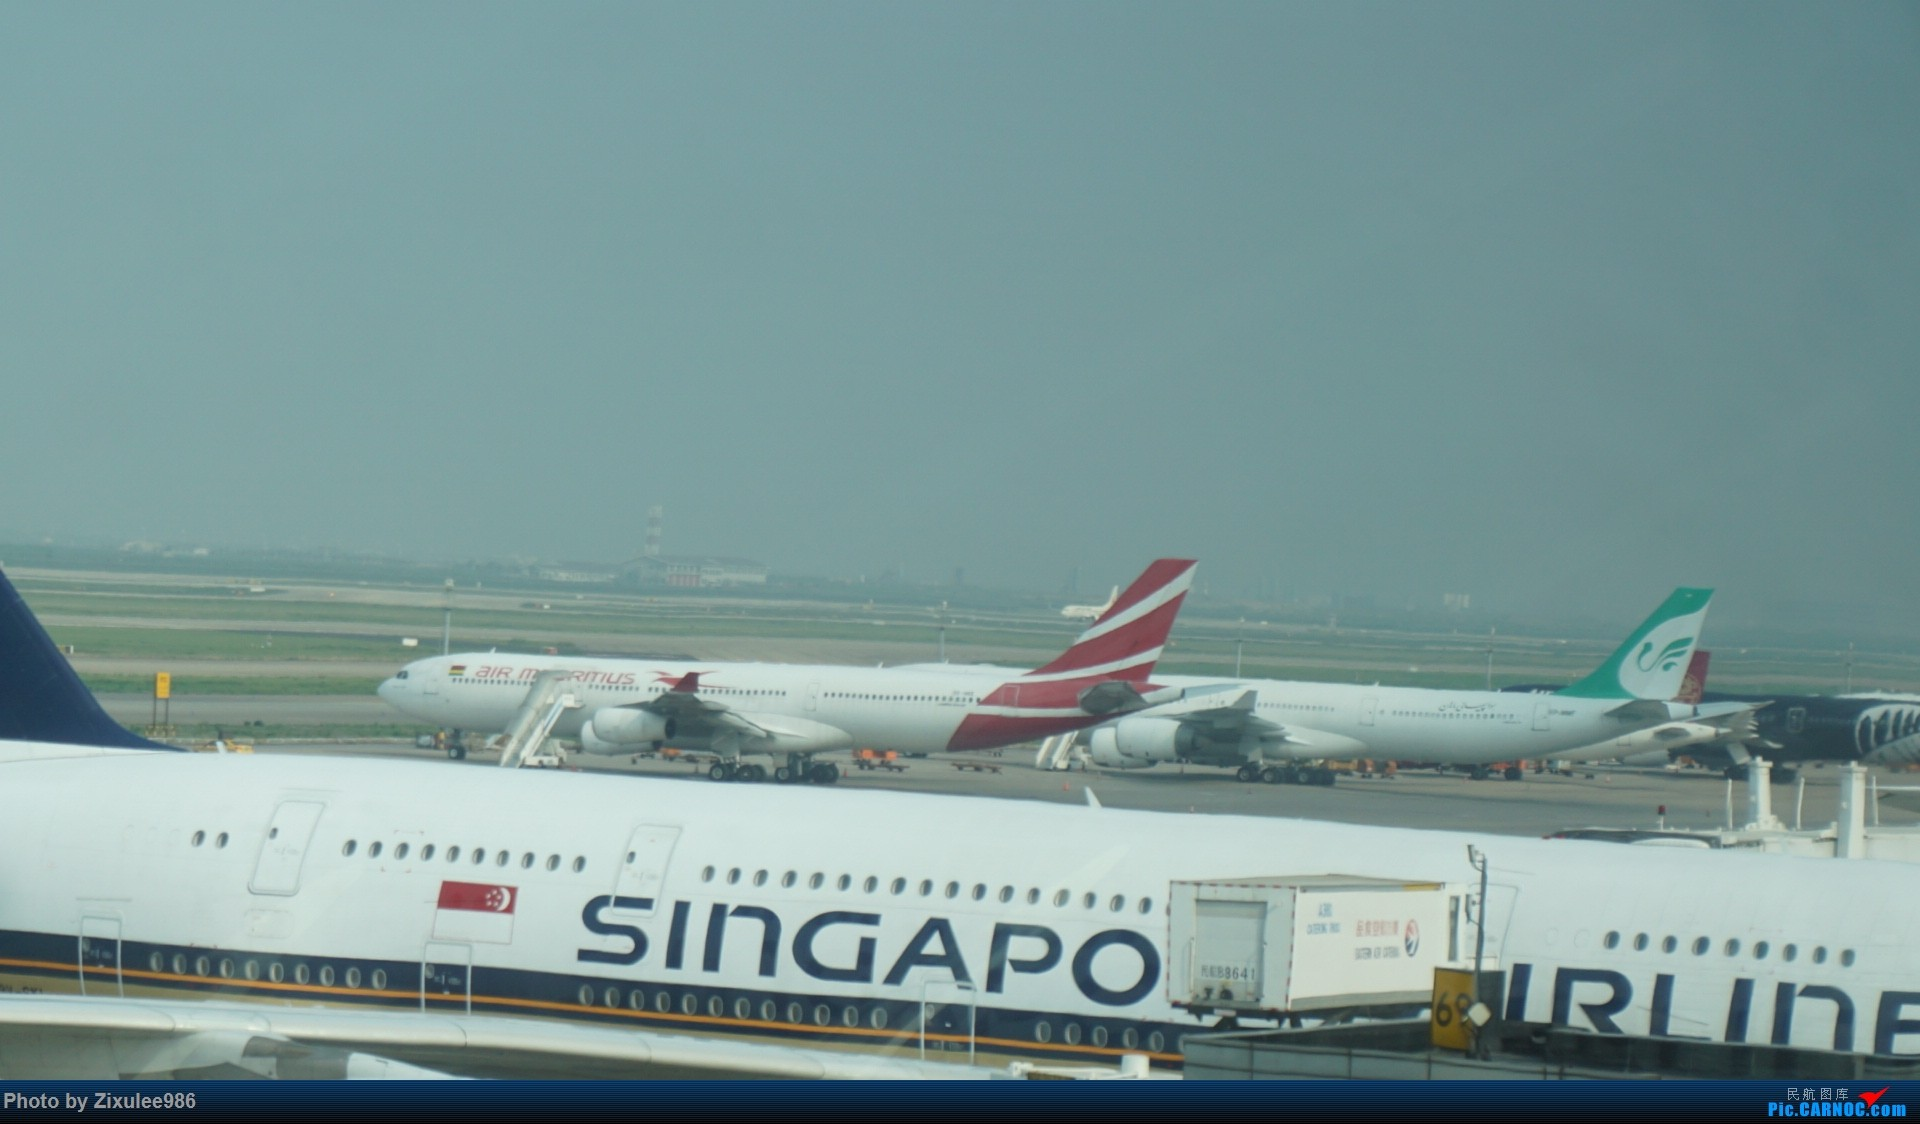 Re:[原创]加拿大21日游学之旅(一)~JJN-PVG-YYZ..(内含flightlog)~第一次发游记~多图缓更请谅解 AIRBUS A380-841 9V-SKL 中国上海浦东国际机场